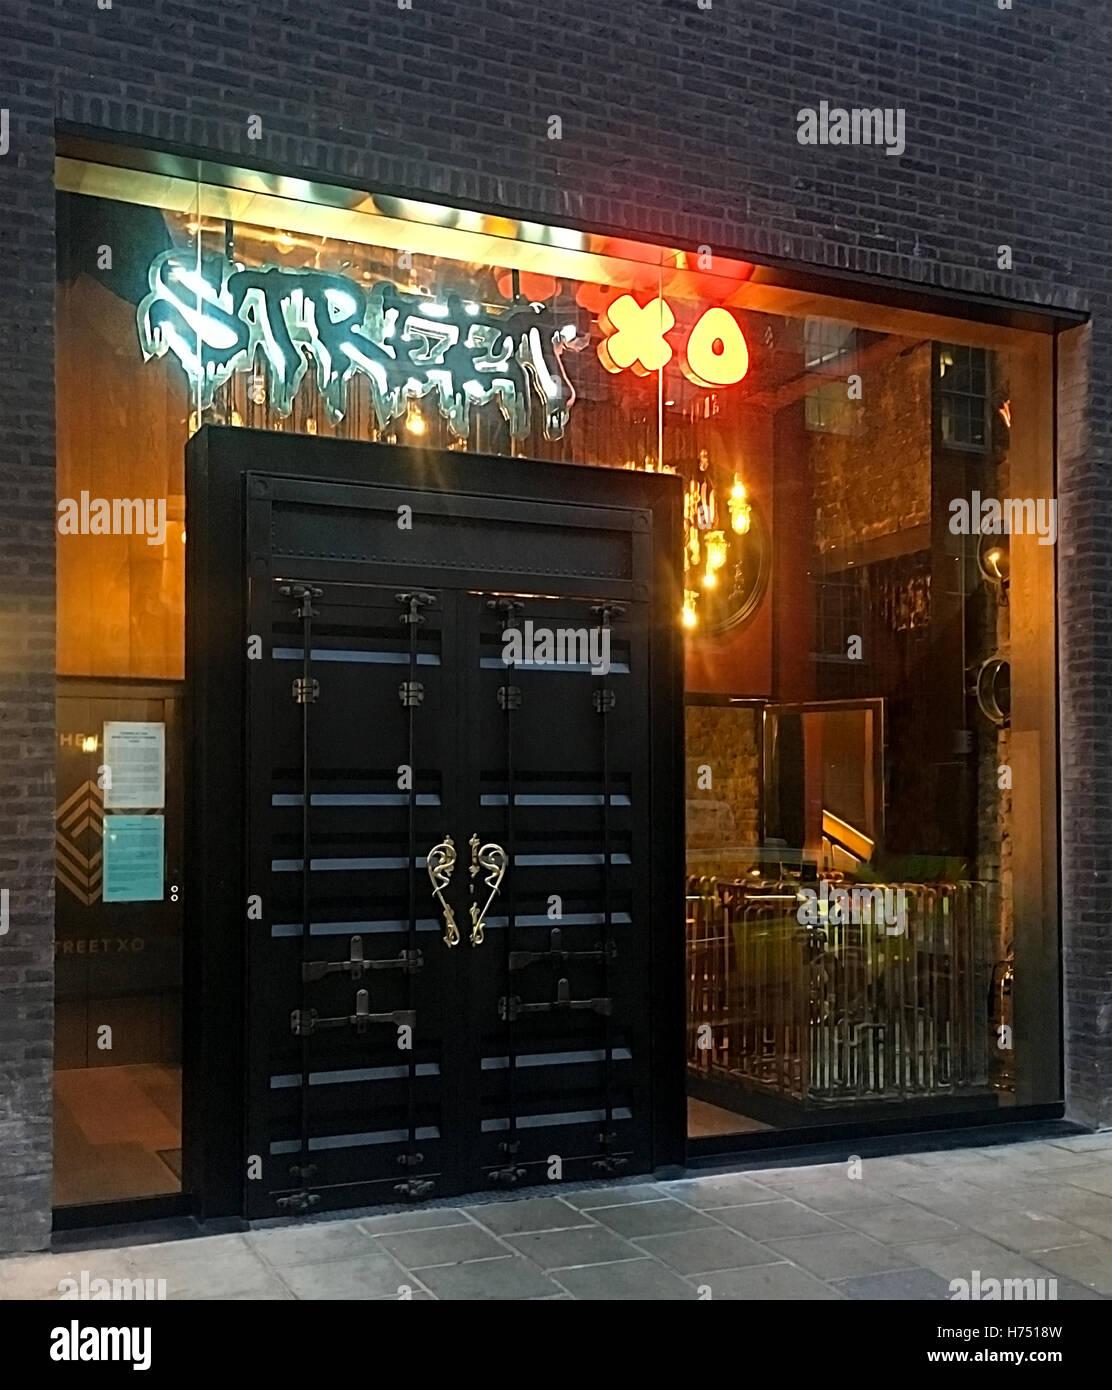 street xo restaurant london - Stock Image